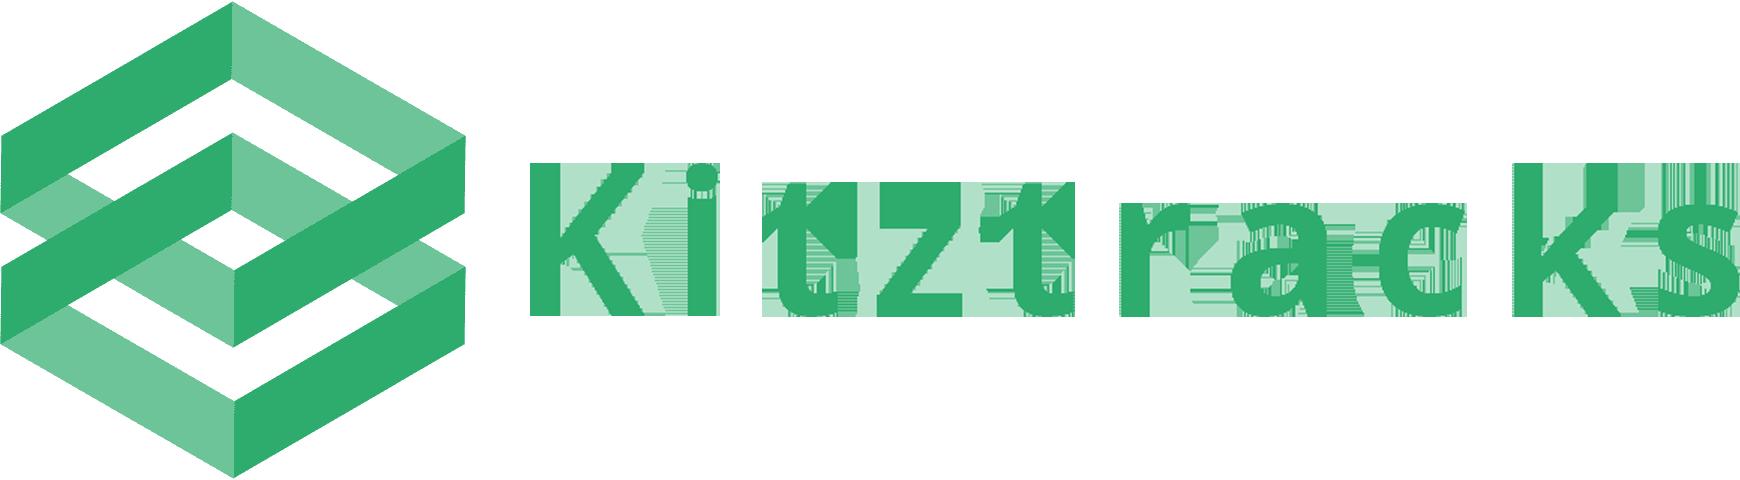 Kitztracks